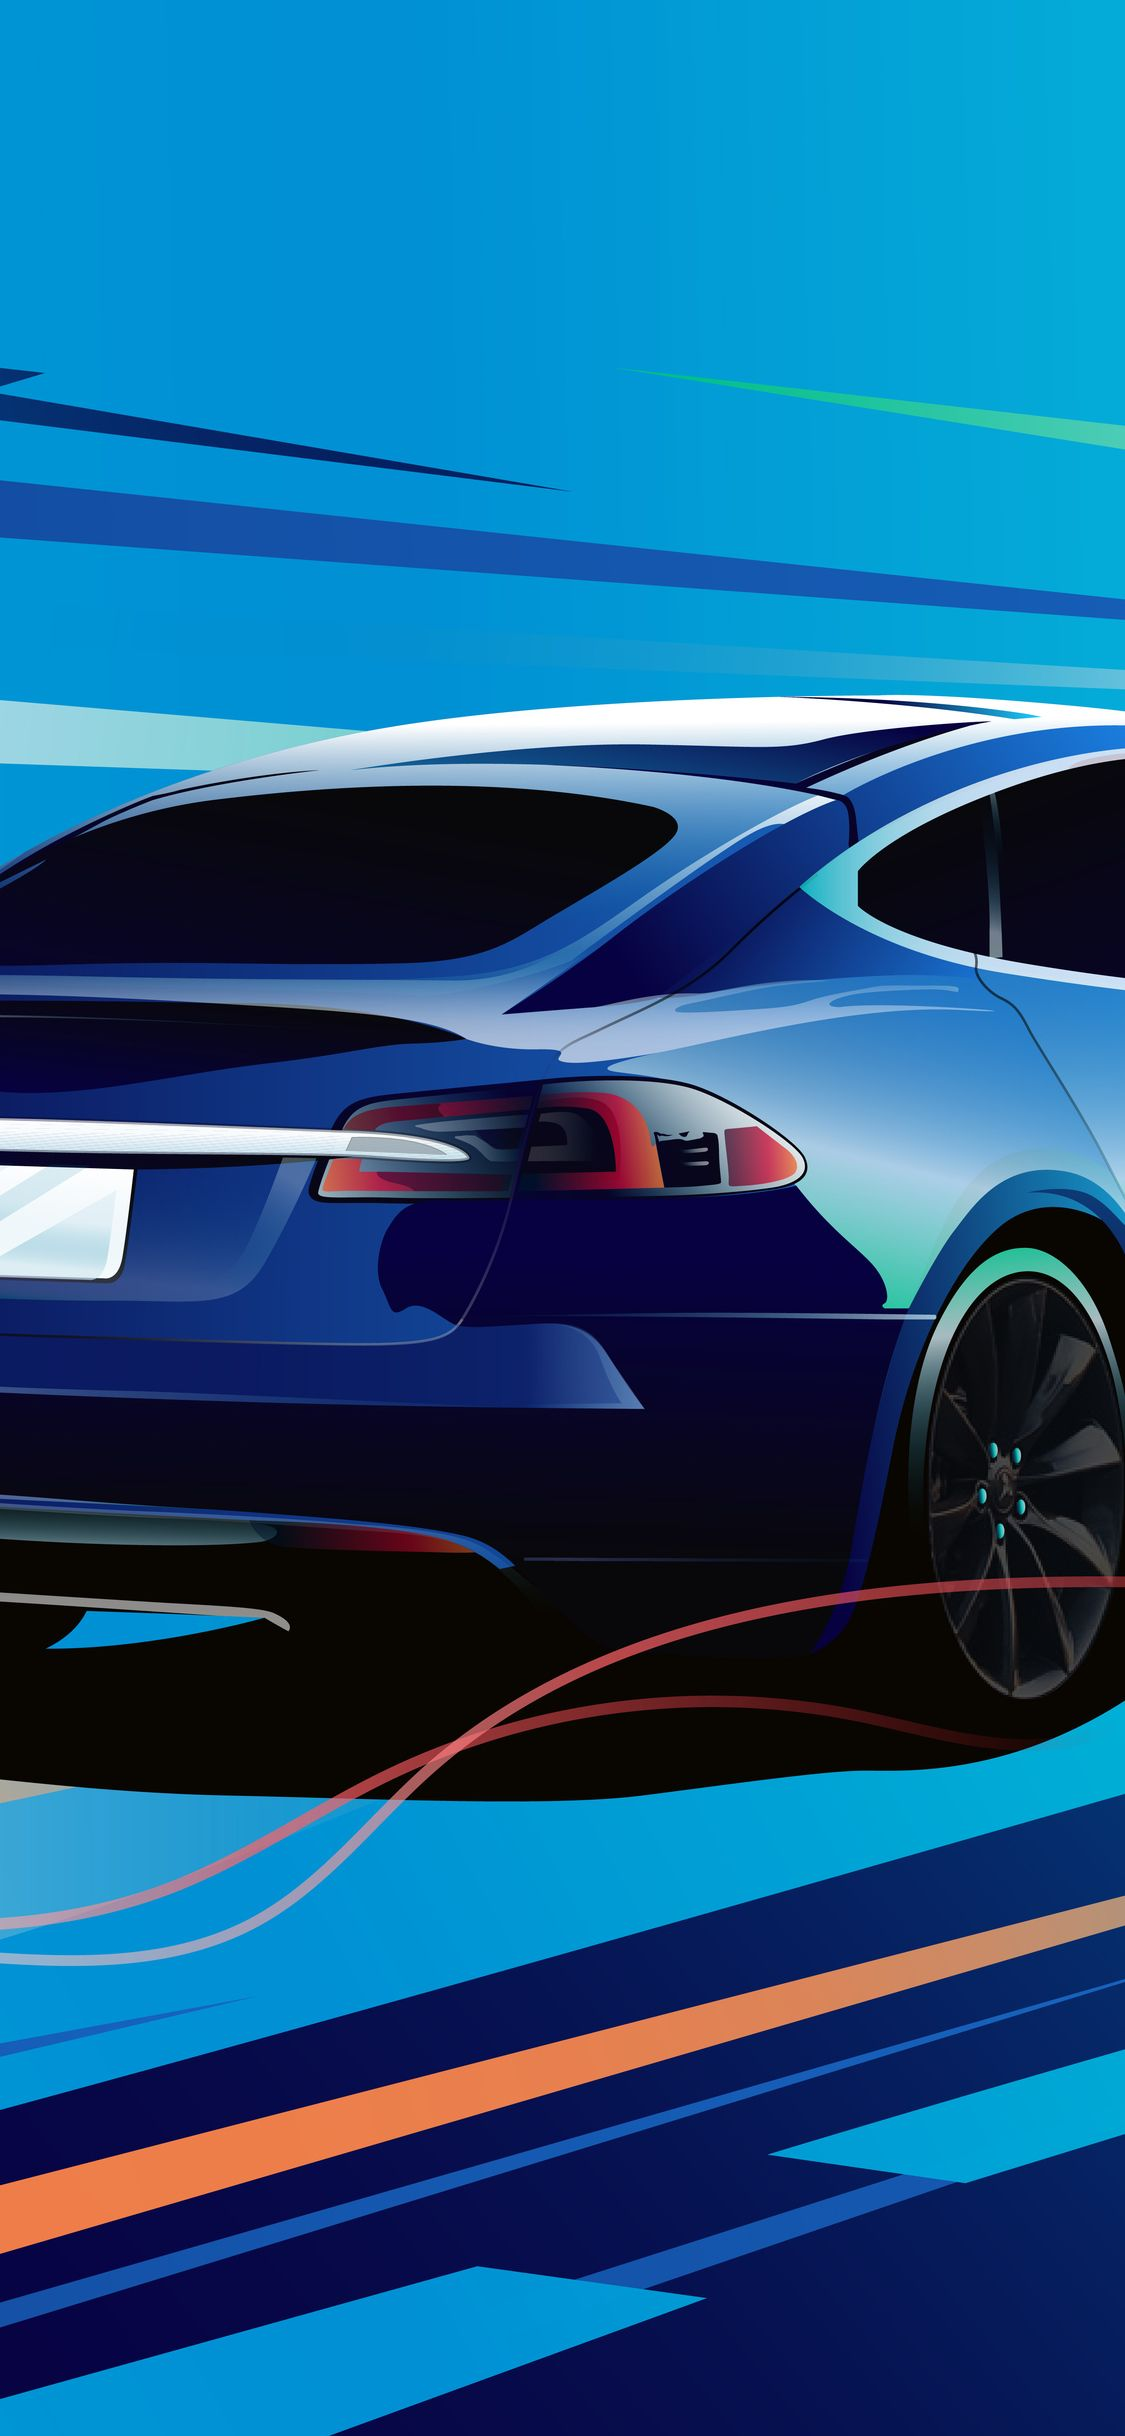 Tesla X Iphone Wallpapers Top Free Tesla X Iphone